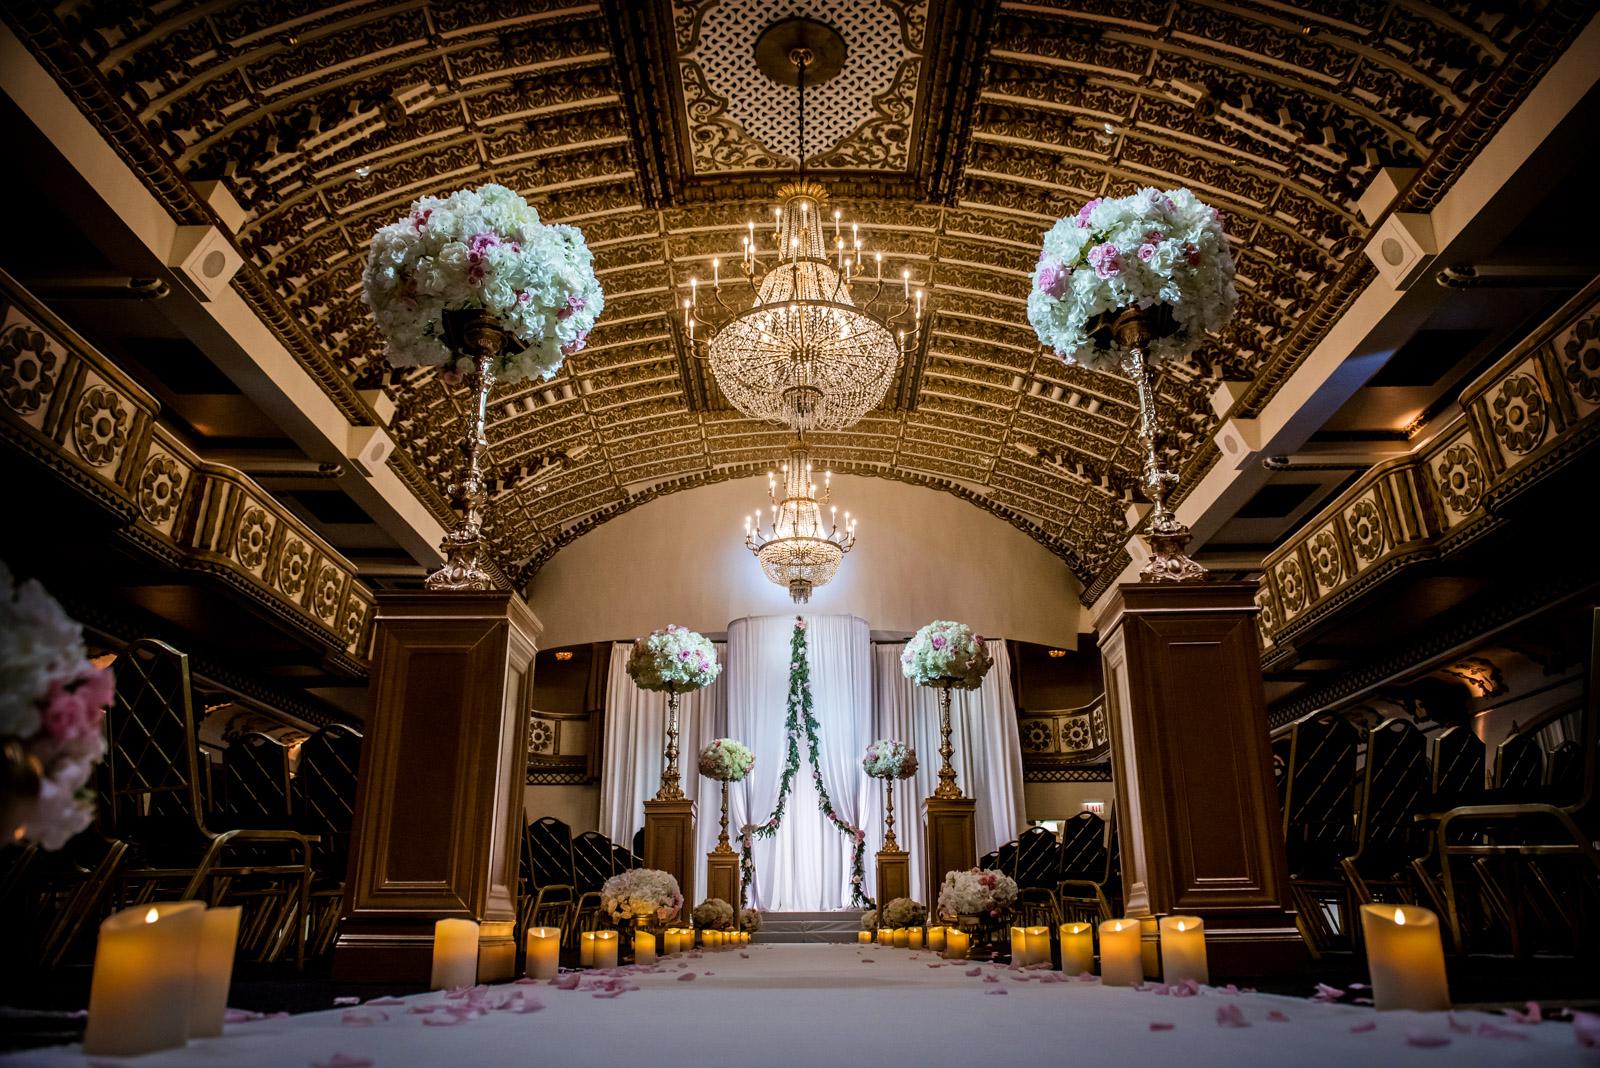 Millennium Knickerbocker Chicago Wedding Ceremony decor Inspiration